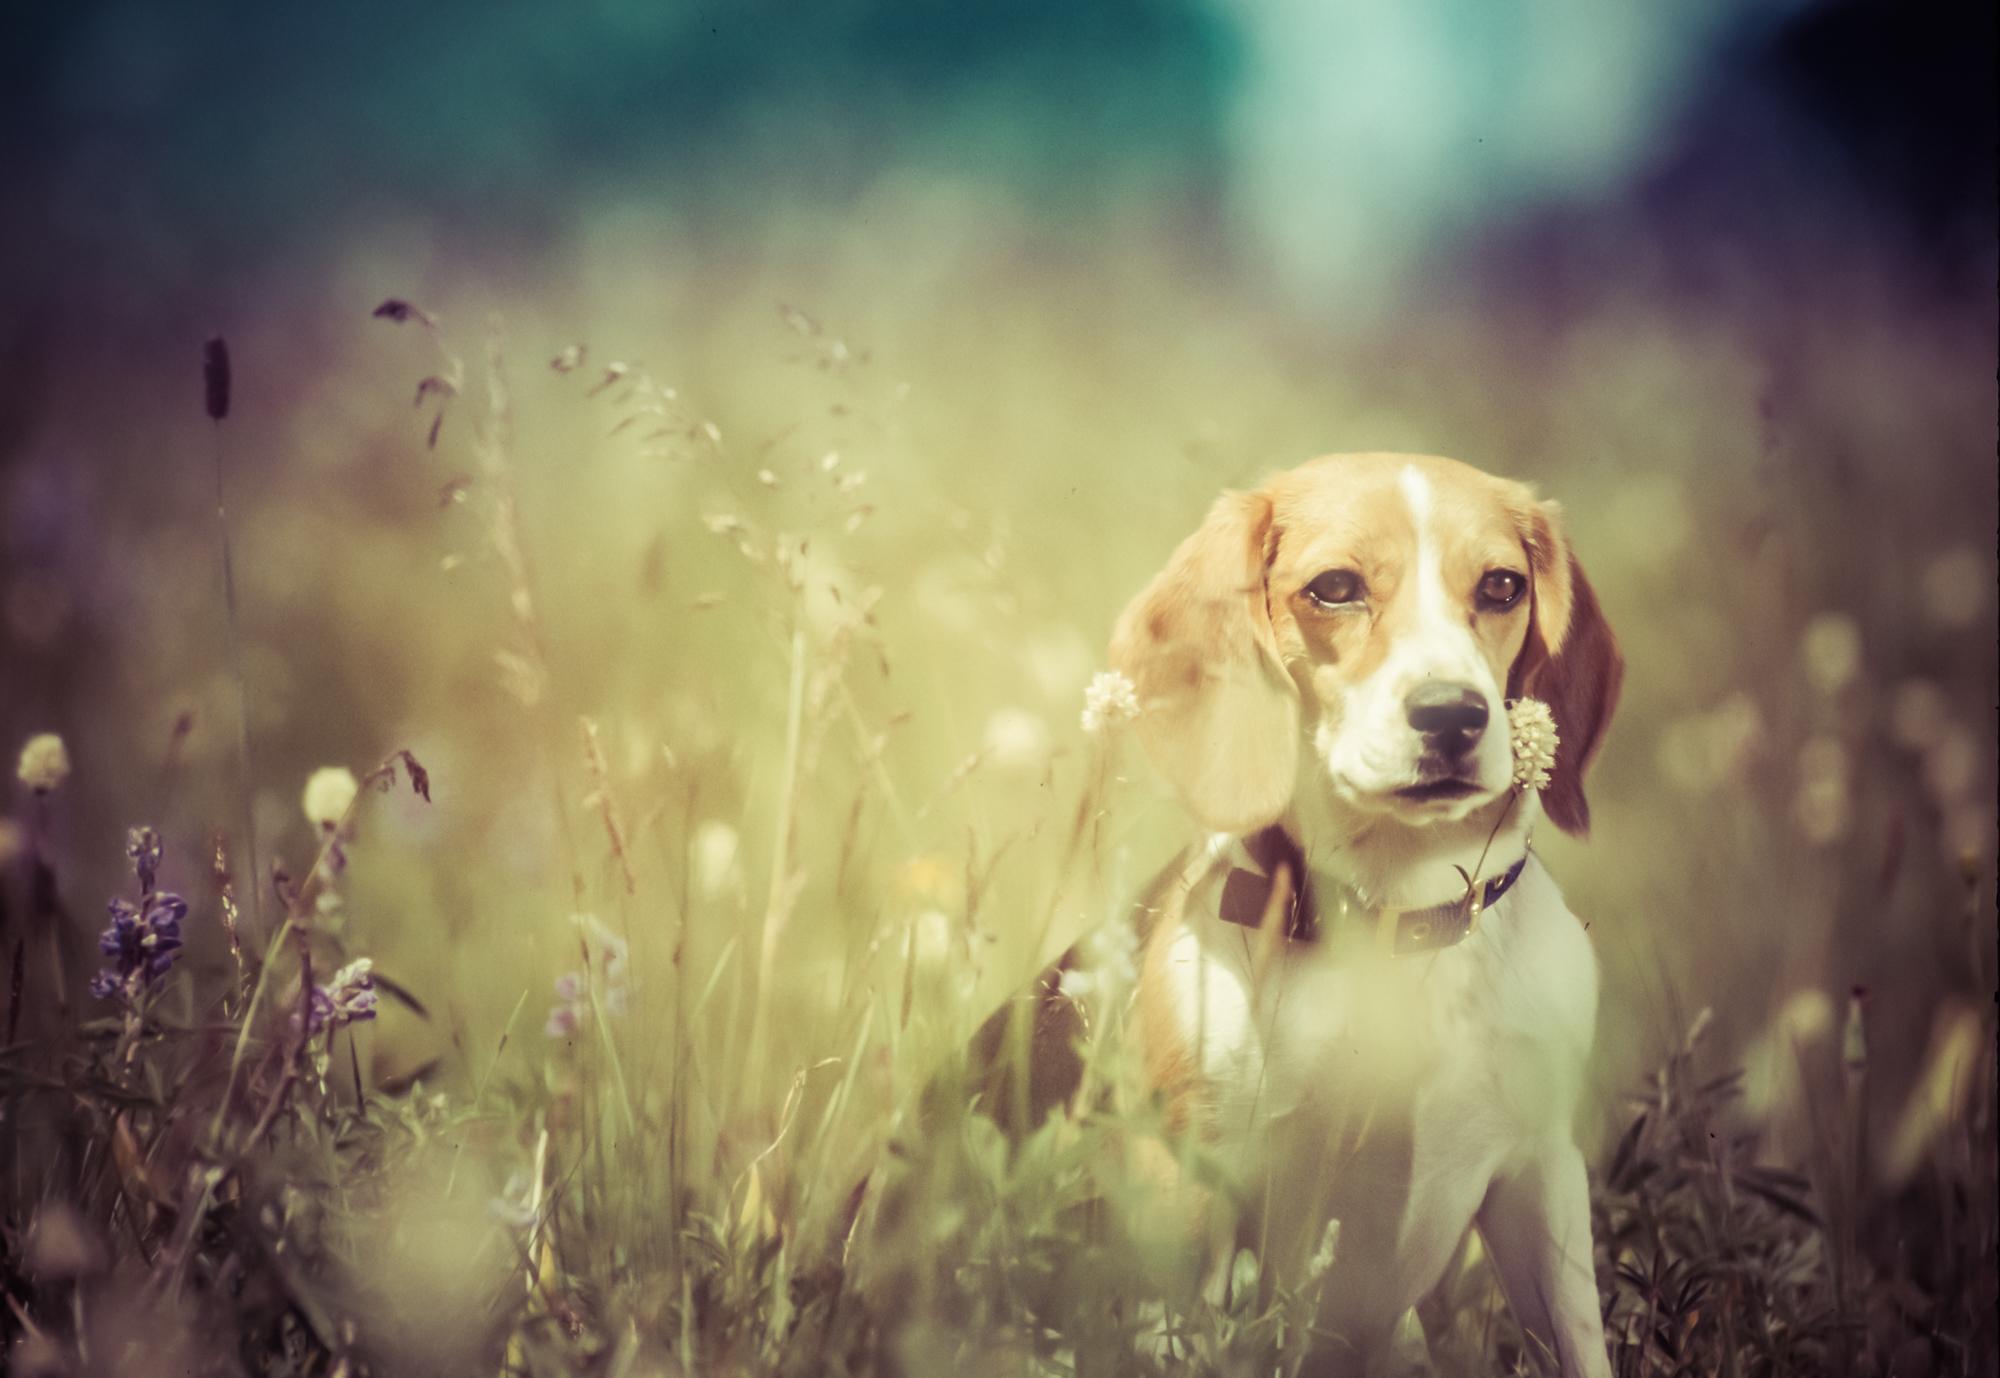 rick-meoli-commercial-photographer-outdoor-animal-lifestyle-repheads-27